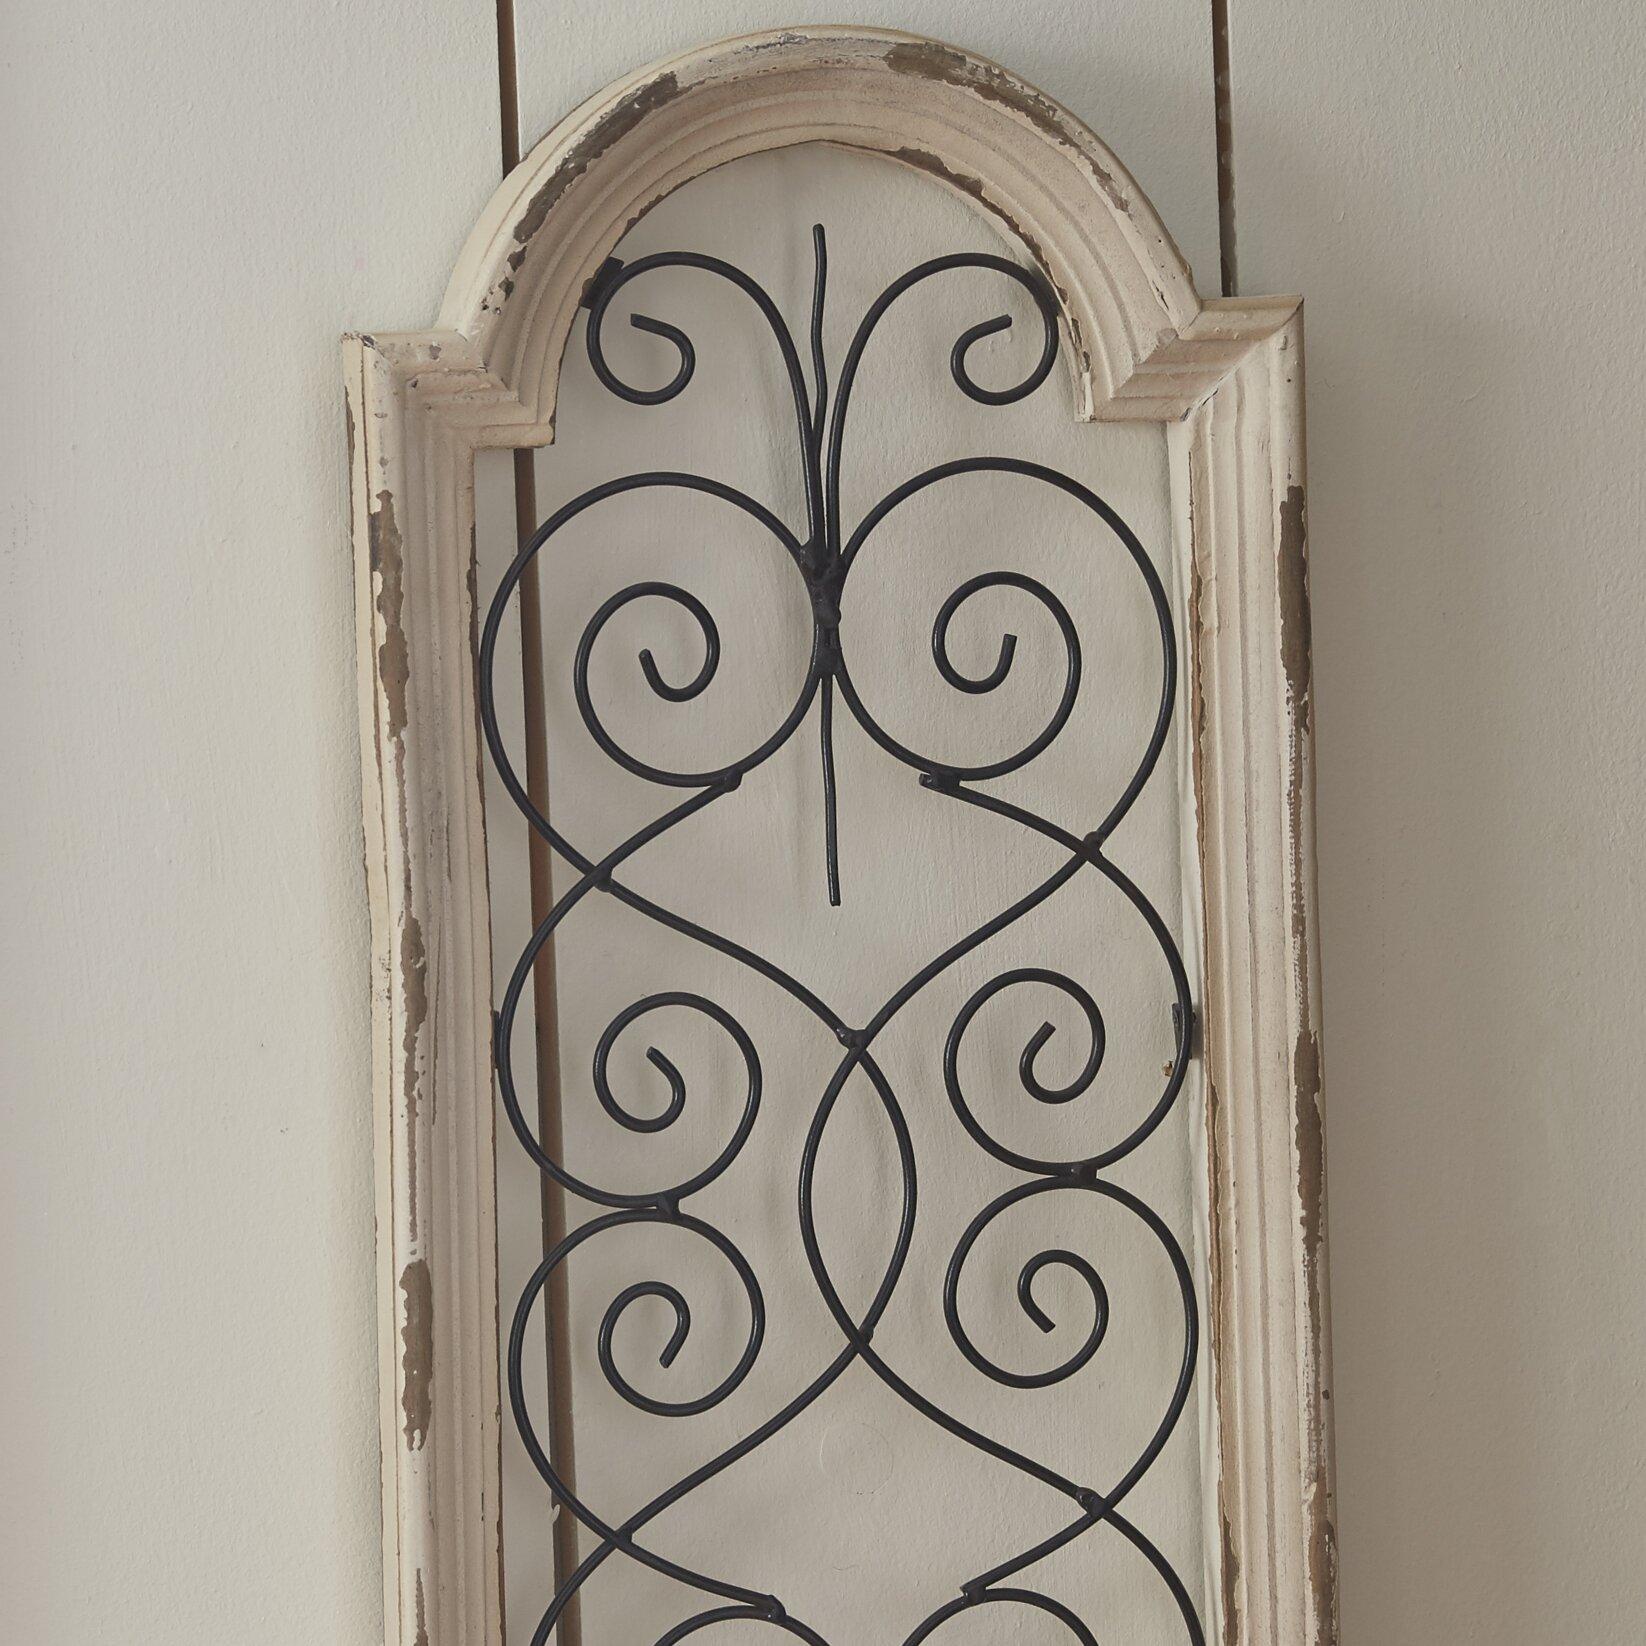 Lark Manoru0026trade; Ivory Wood/Metal Wall ...